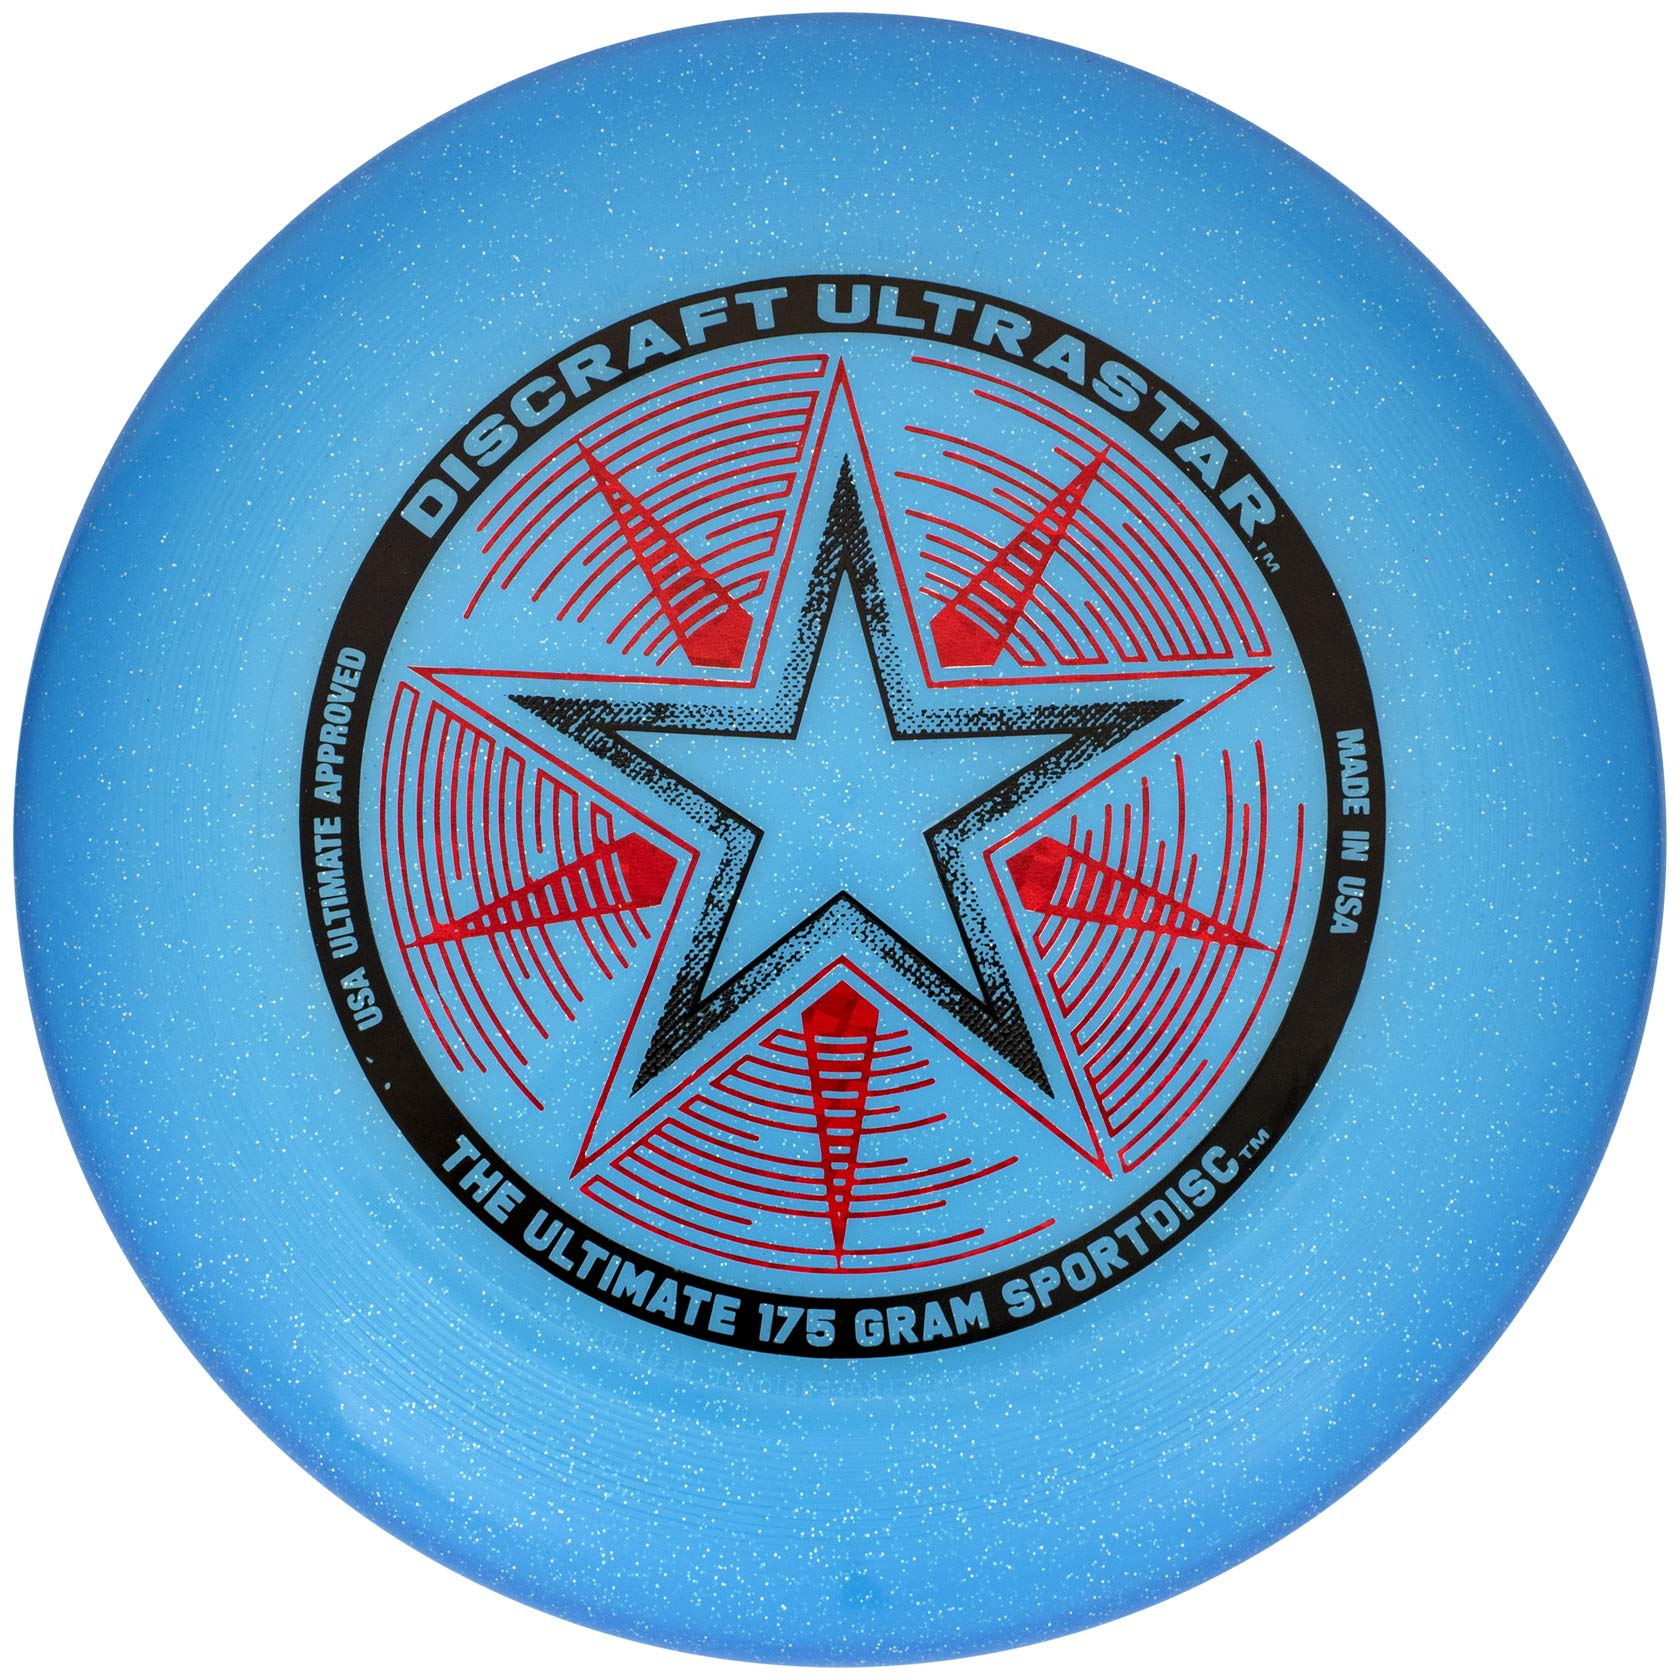 Discraft 175 gram Ultra Star Sport Disc, Blue Sparkle by Discraft